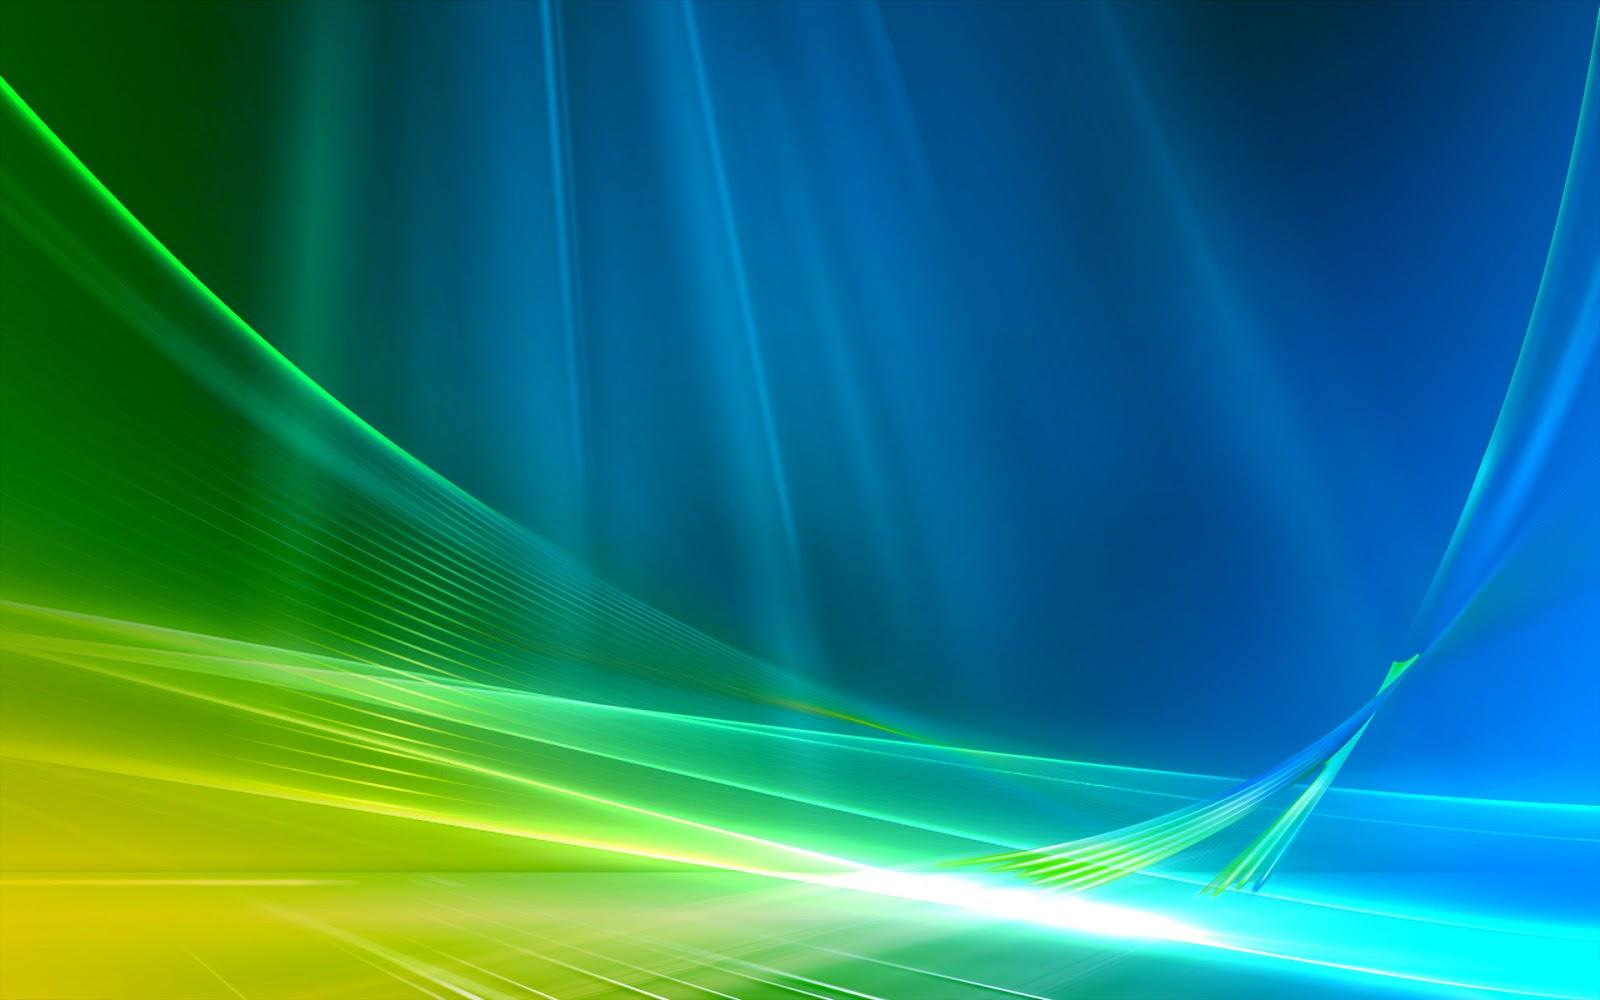 1080P Windows 10 Wallpaper